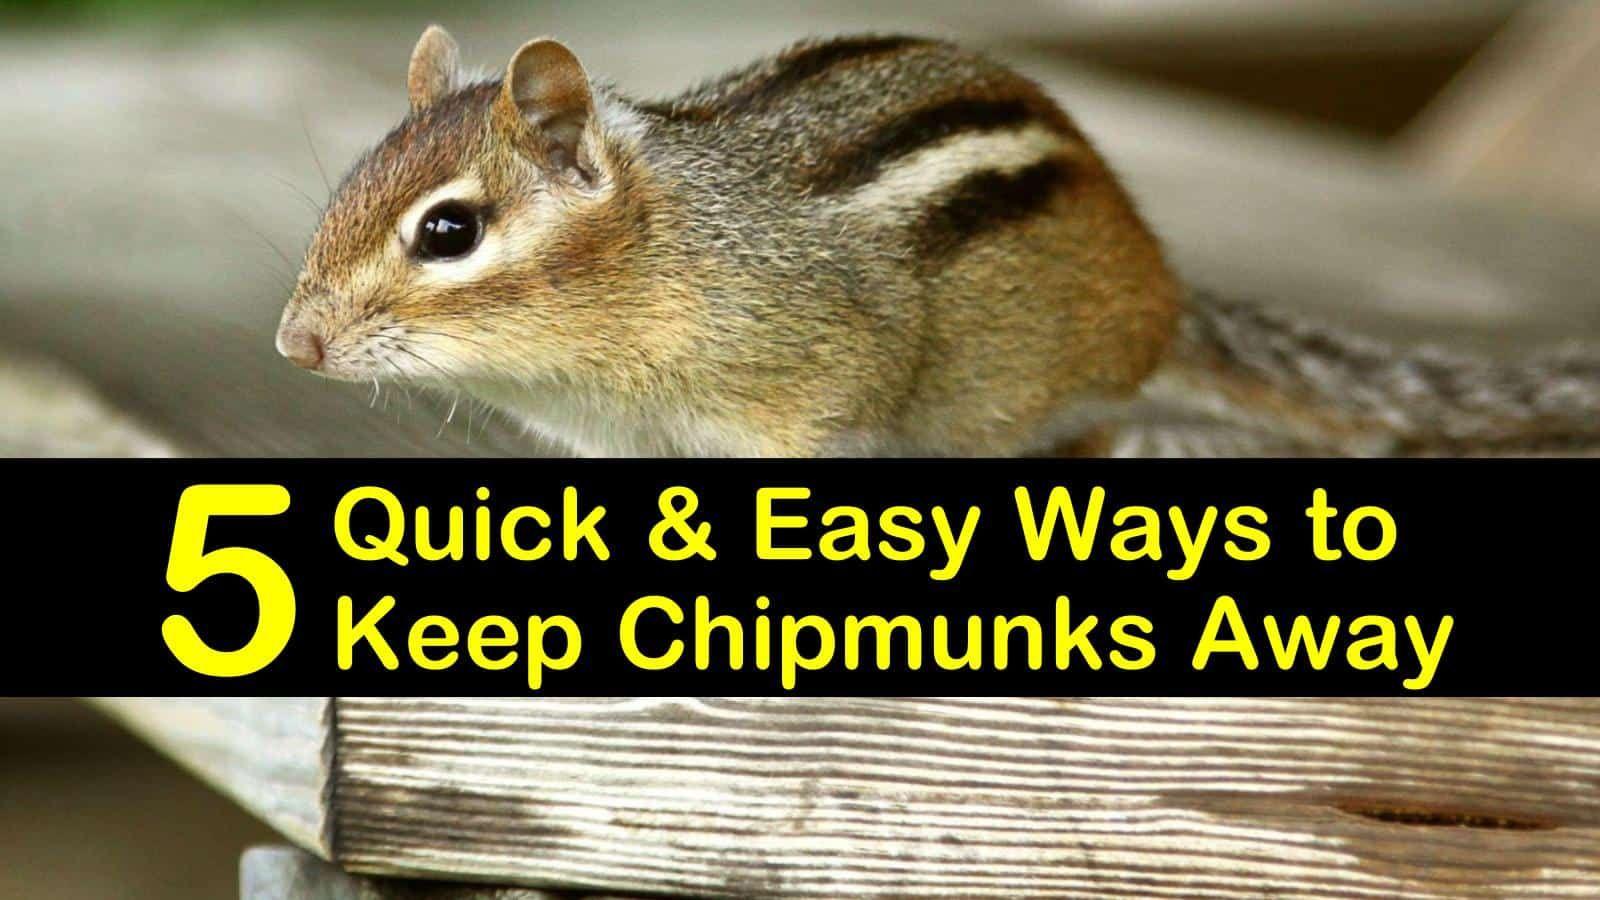 5 Quick Easy Ways To Keep Chipmunks Away In 2020 Chipmunks Chipmunk Repellent Get Rid Of Chipmunks